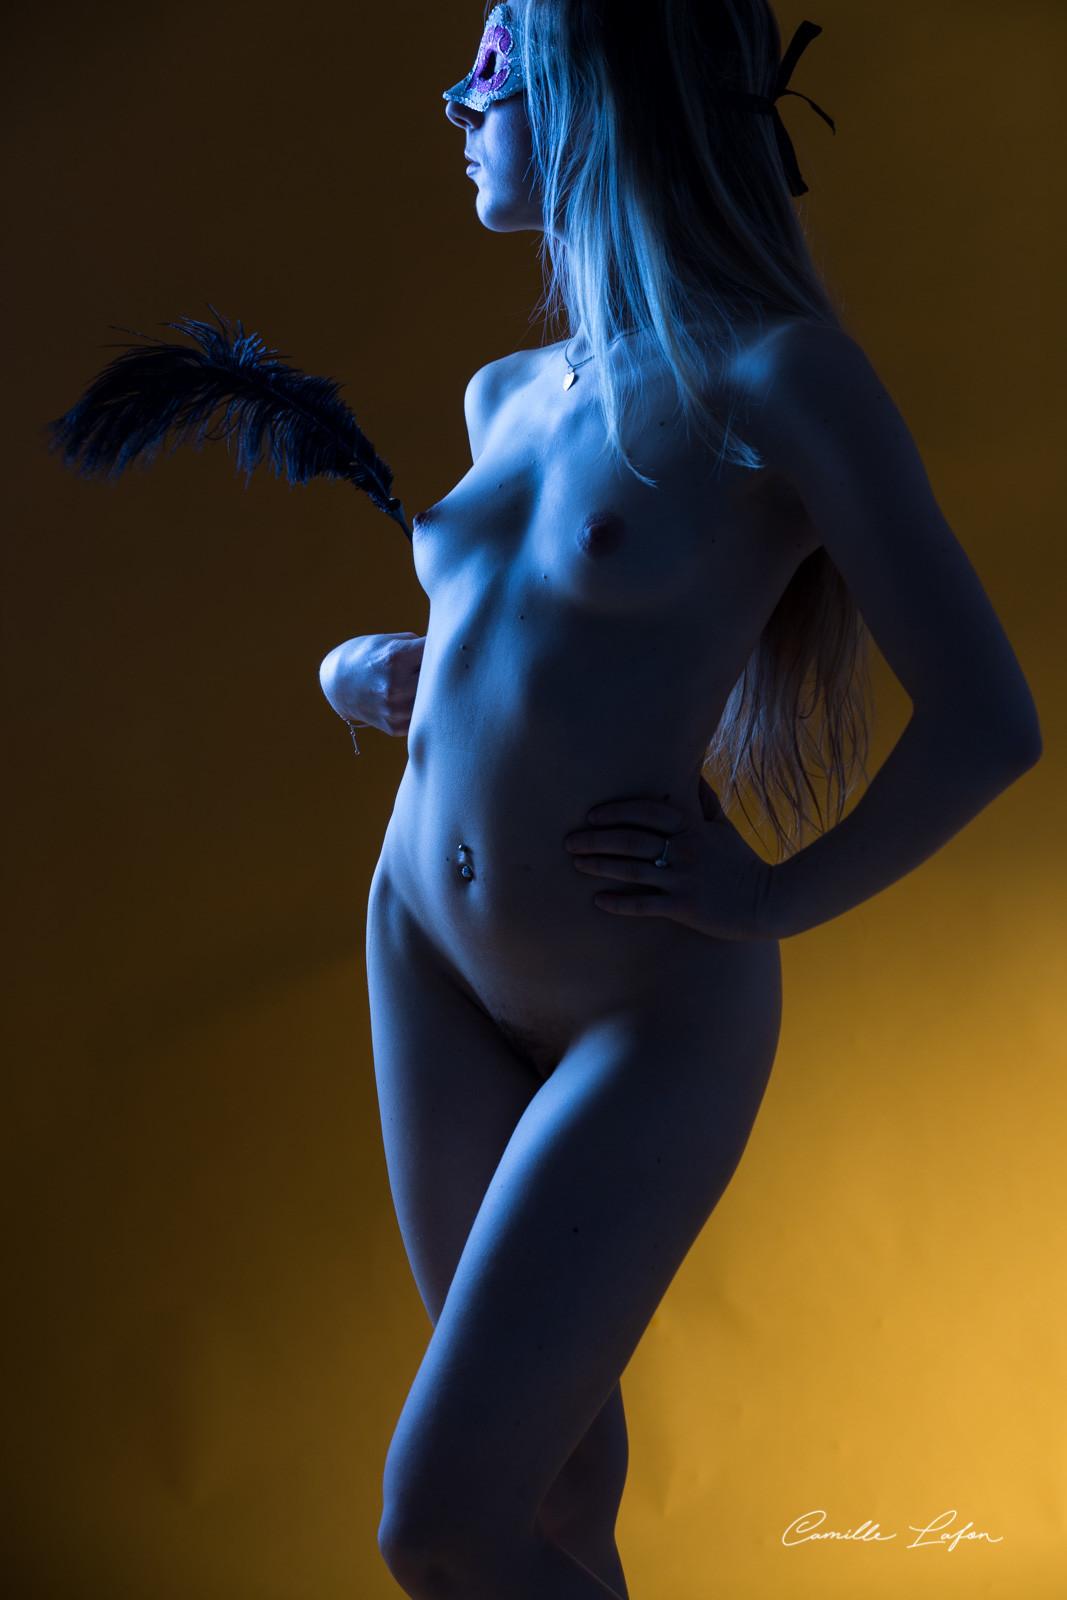 photographe montpellier boudoir nu ballerine elegante